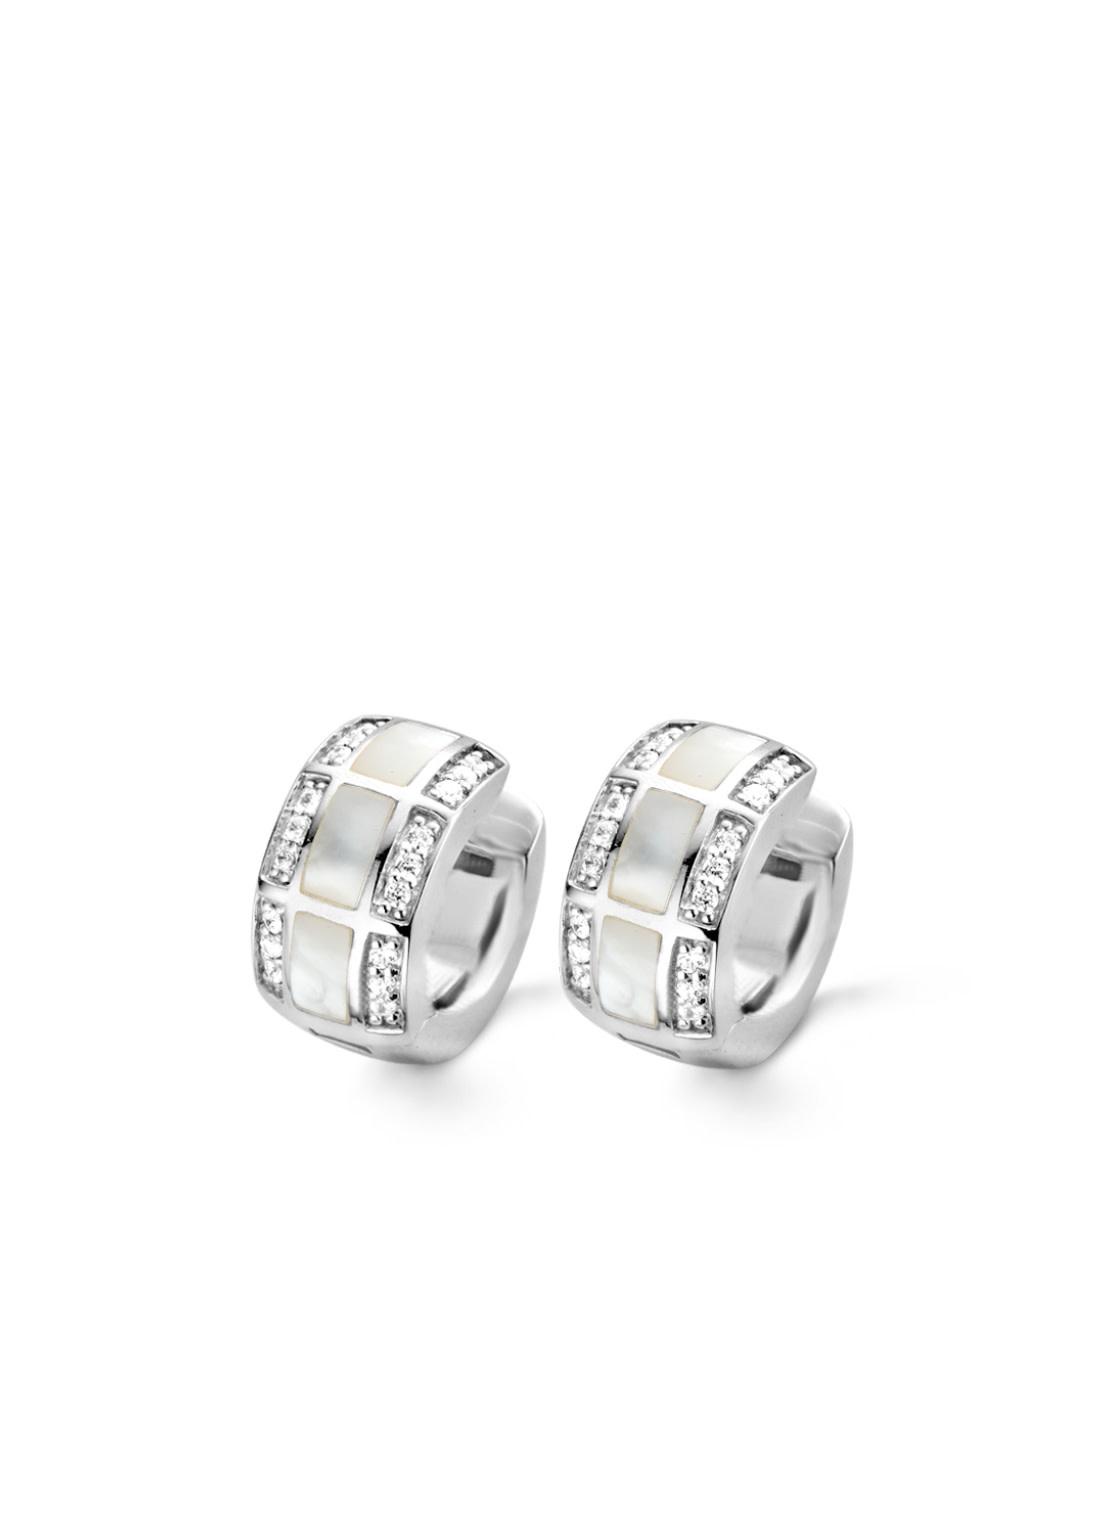 TI SENTO - Milano Earrings 7530MW-2